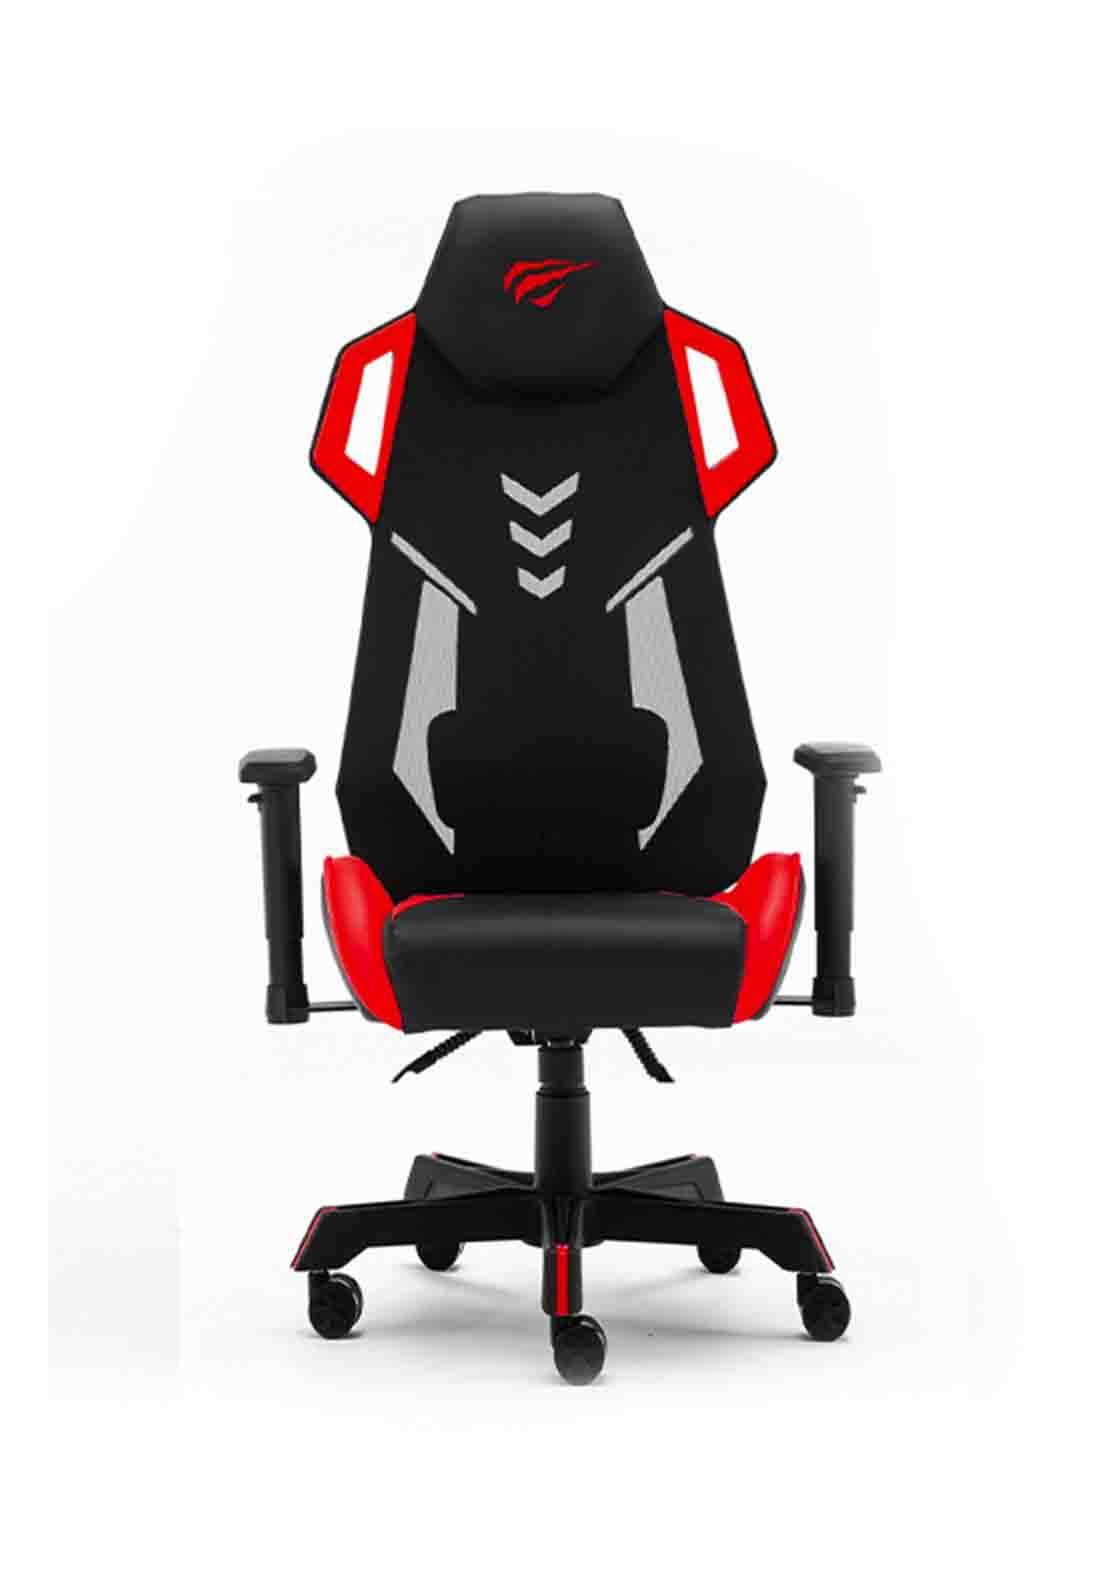 Havit GC935 Gaming Chair - Black and Red كرسي العاب